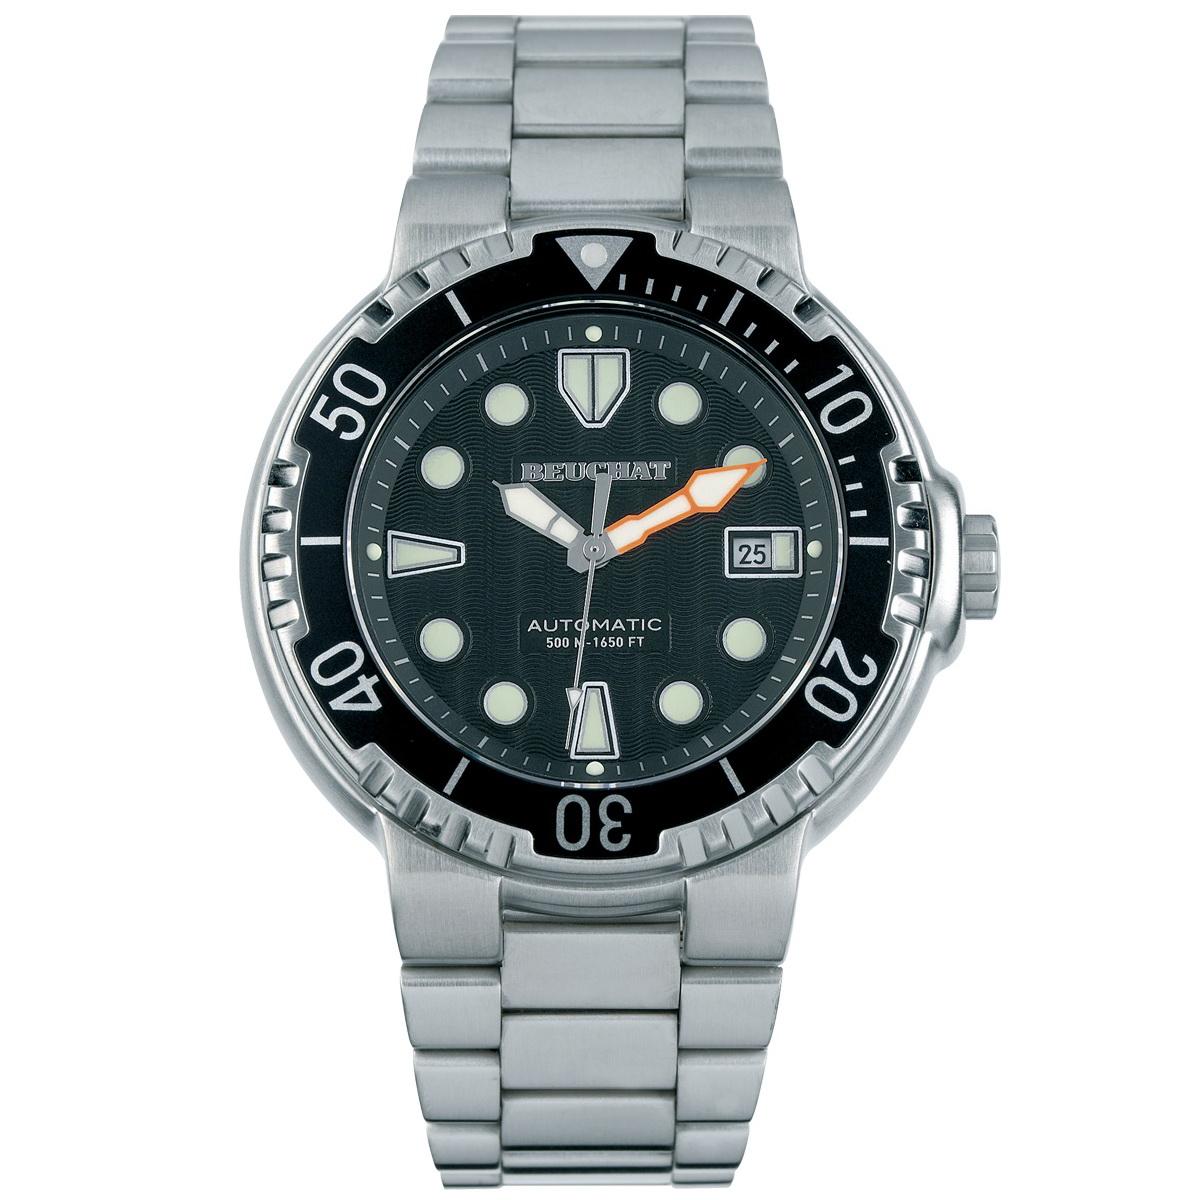 Beuchat's Lumitech Automatic 500 and 1000m Divers BEUCHAT%2BLumitech%2BAUTO%2B500M